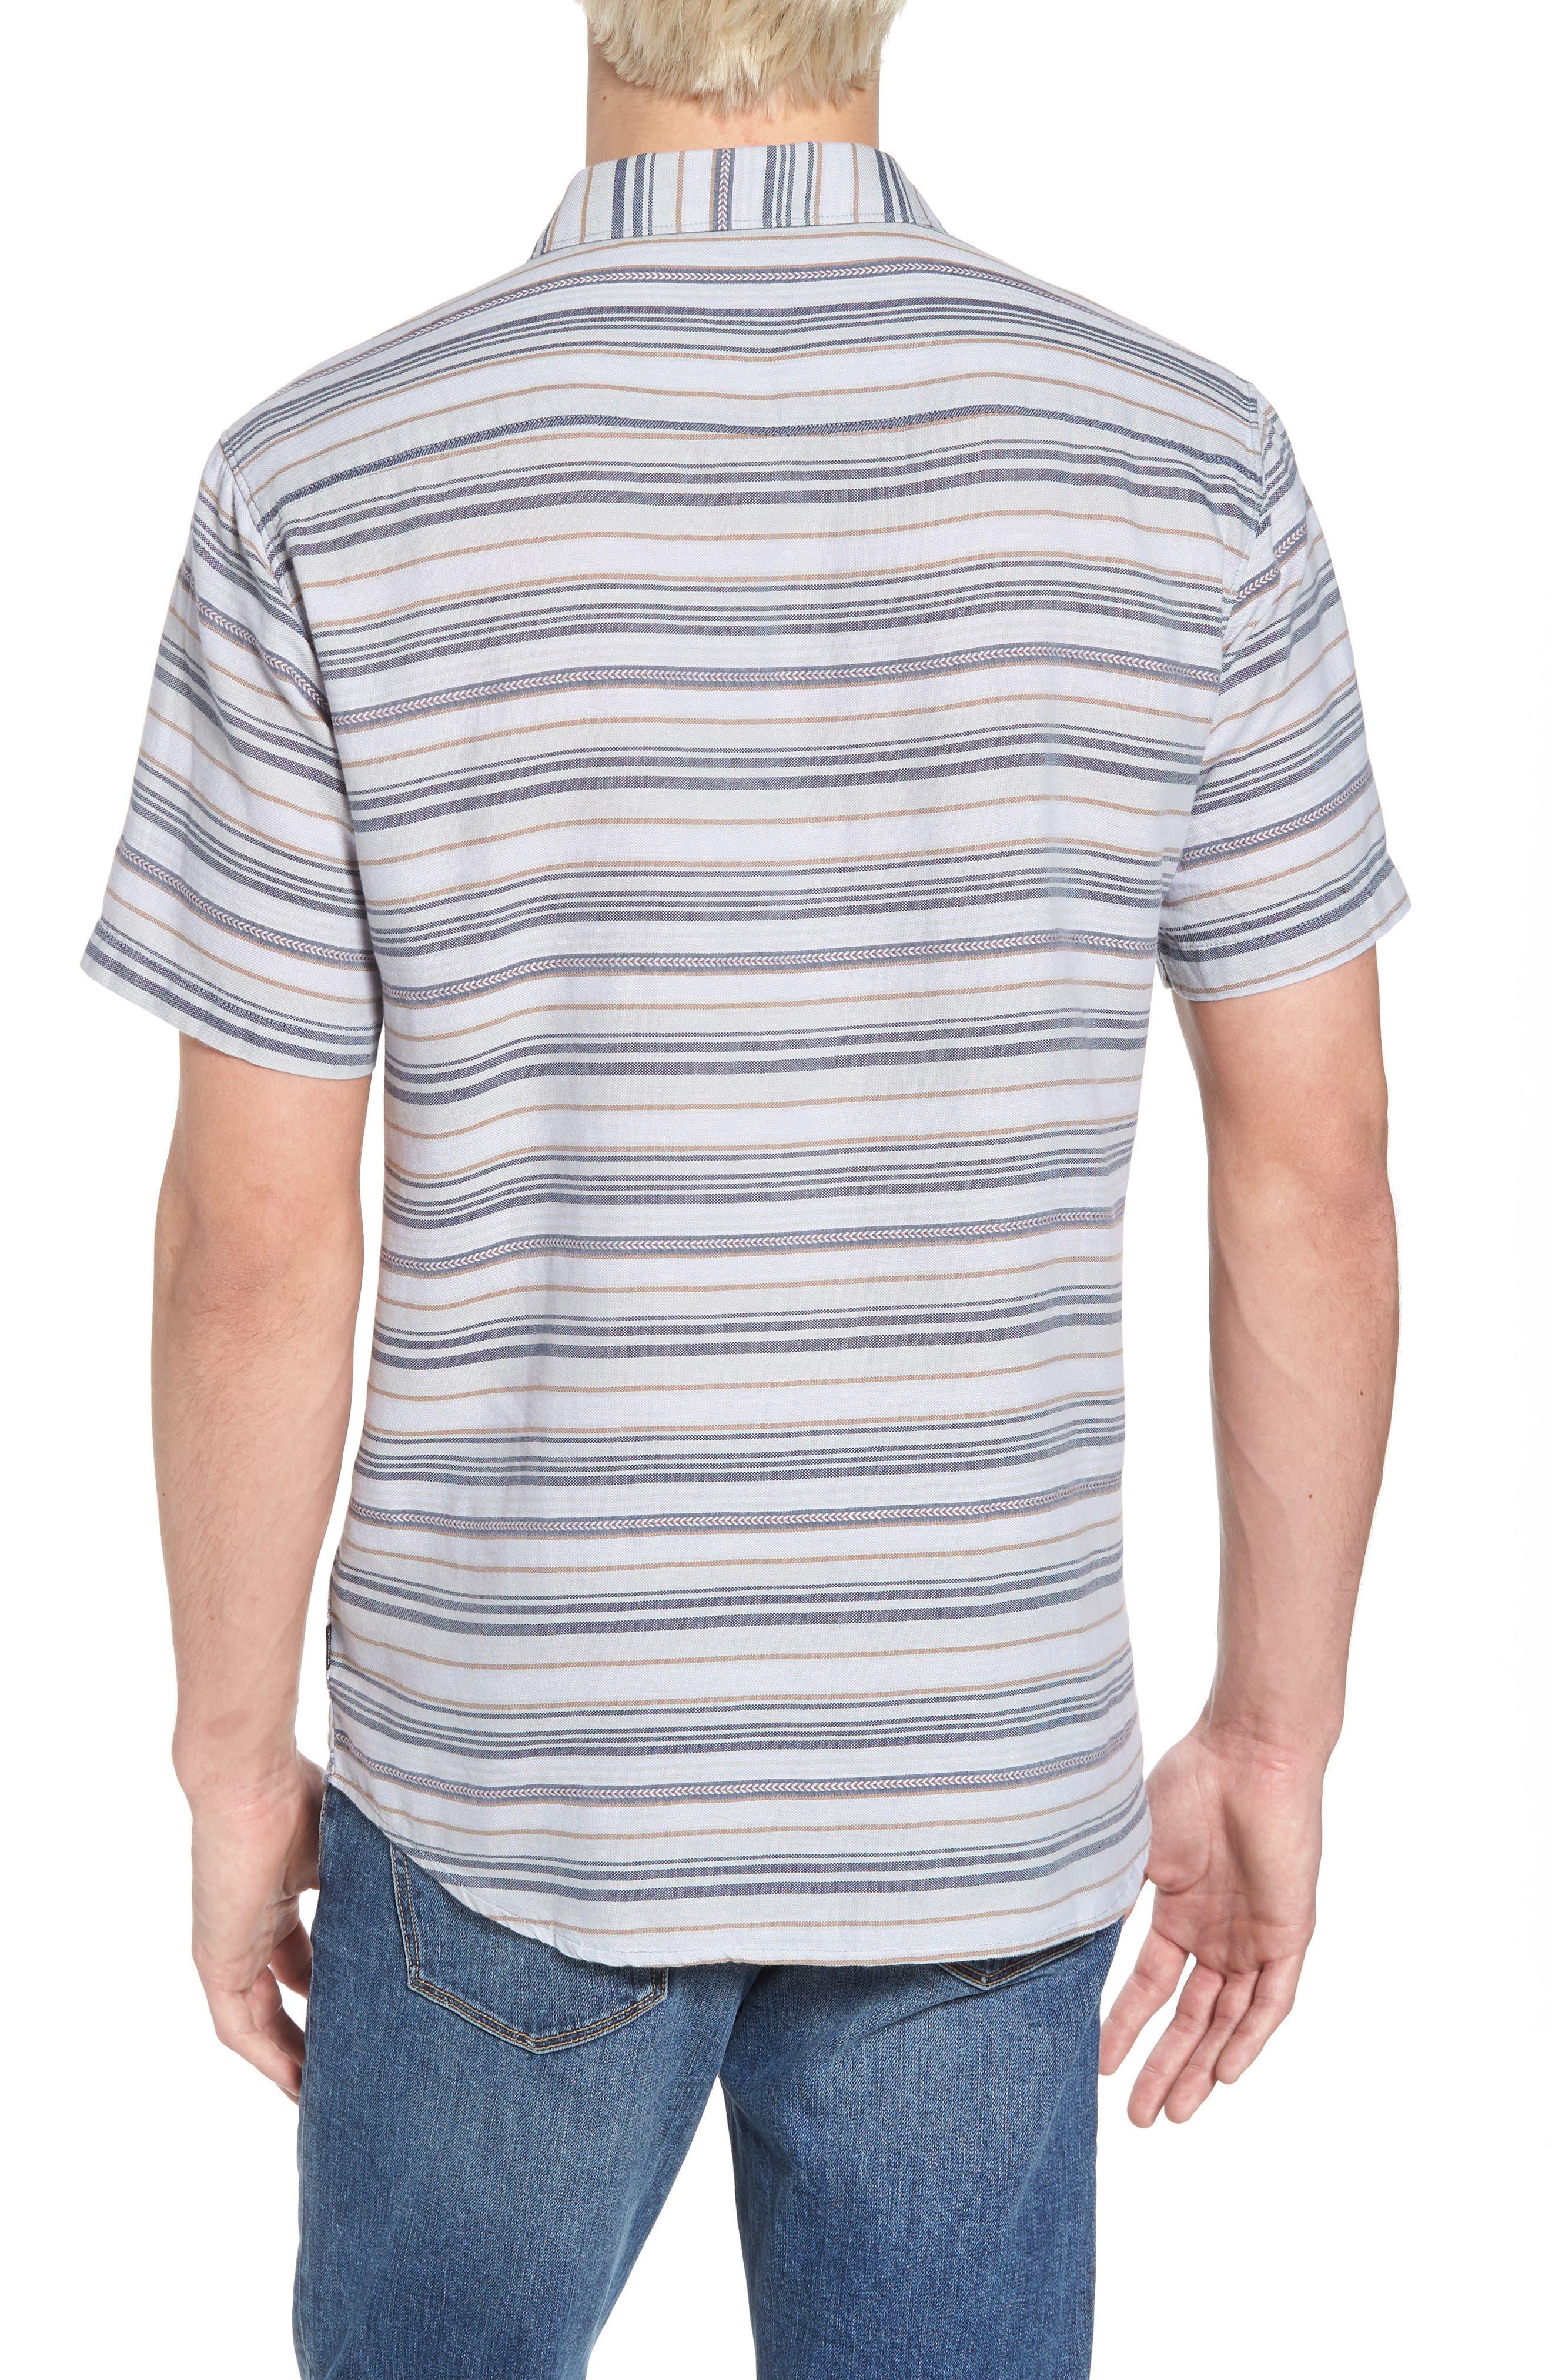 Currington Short Sleeve Shirt,                             Alternate thumbnail 2, color,                             Light Blue